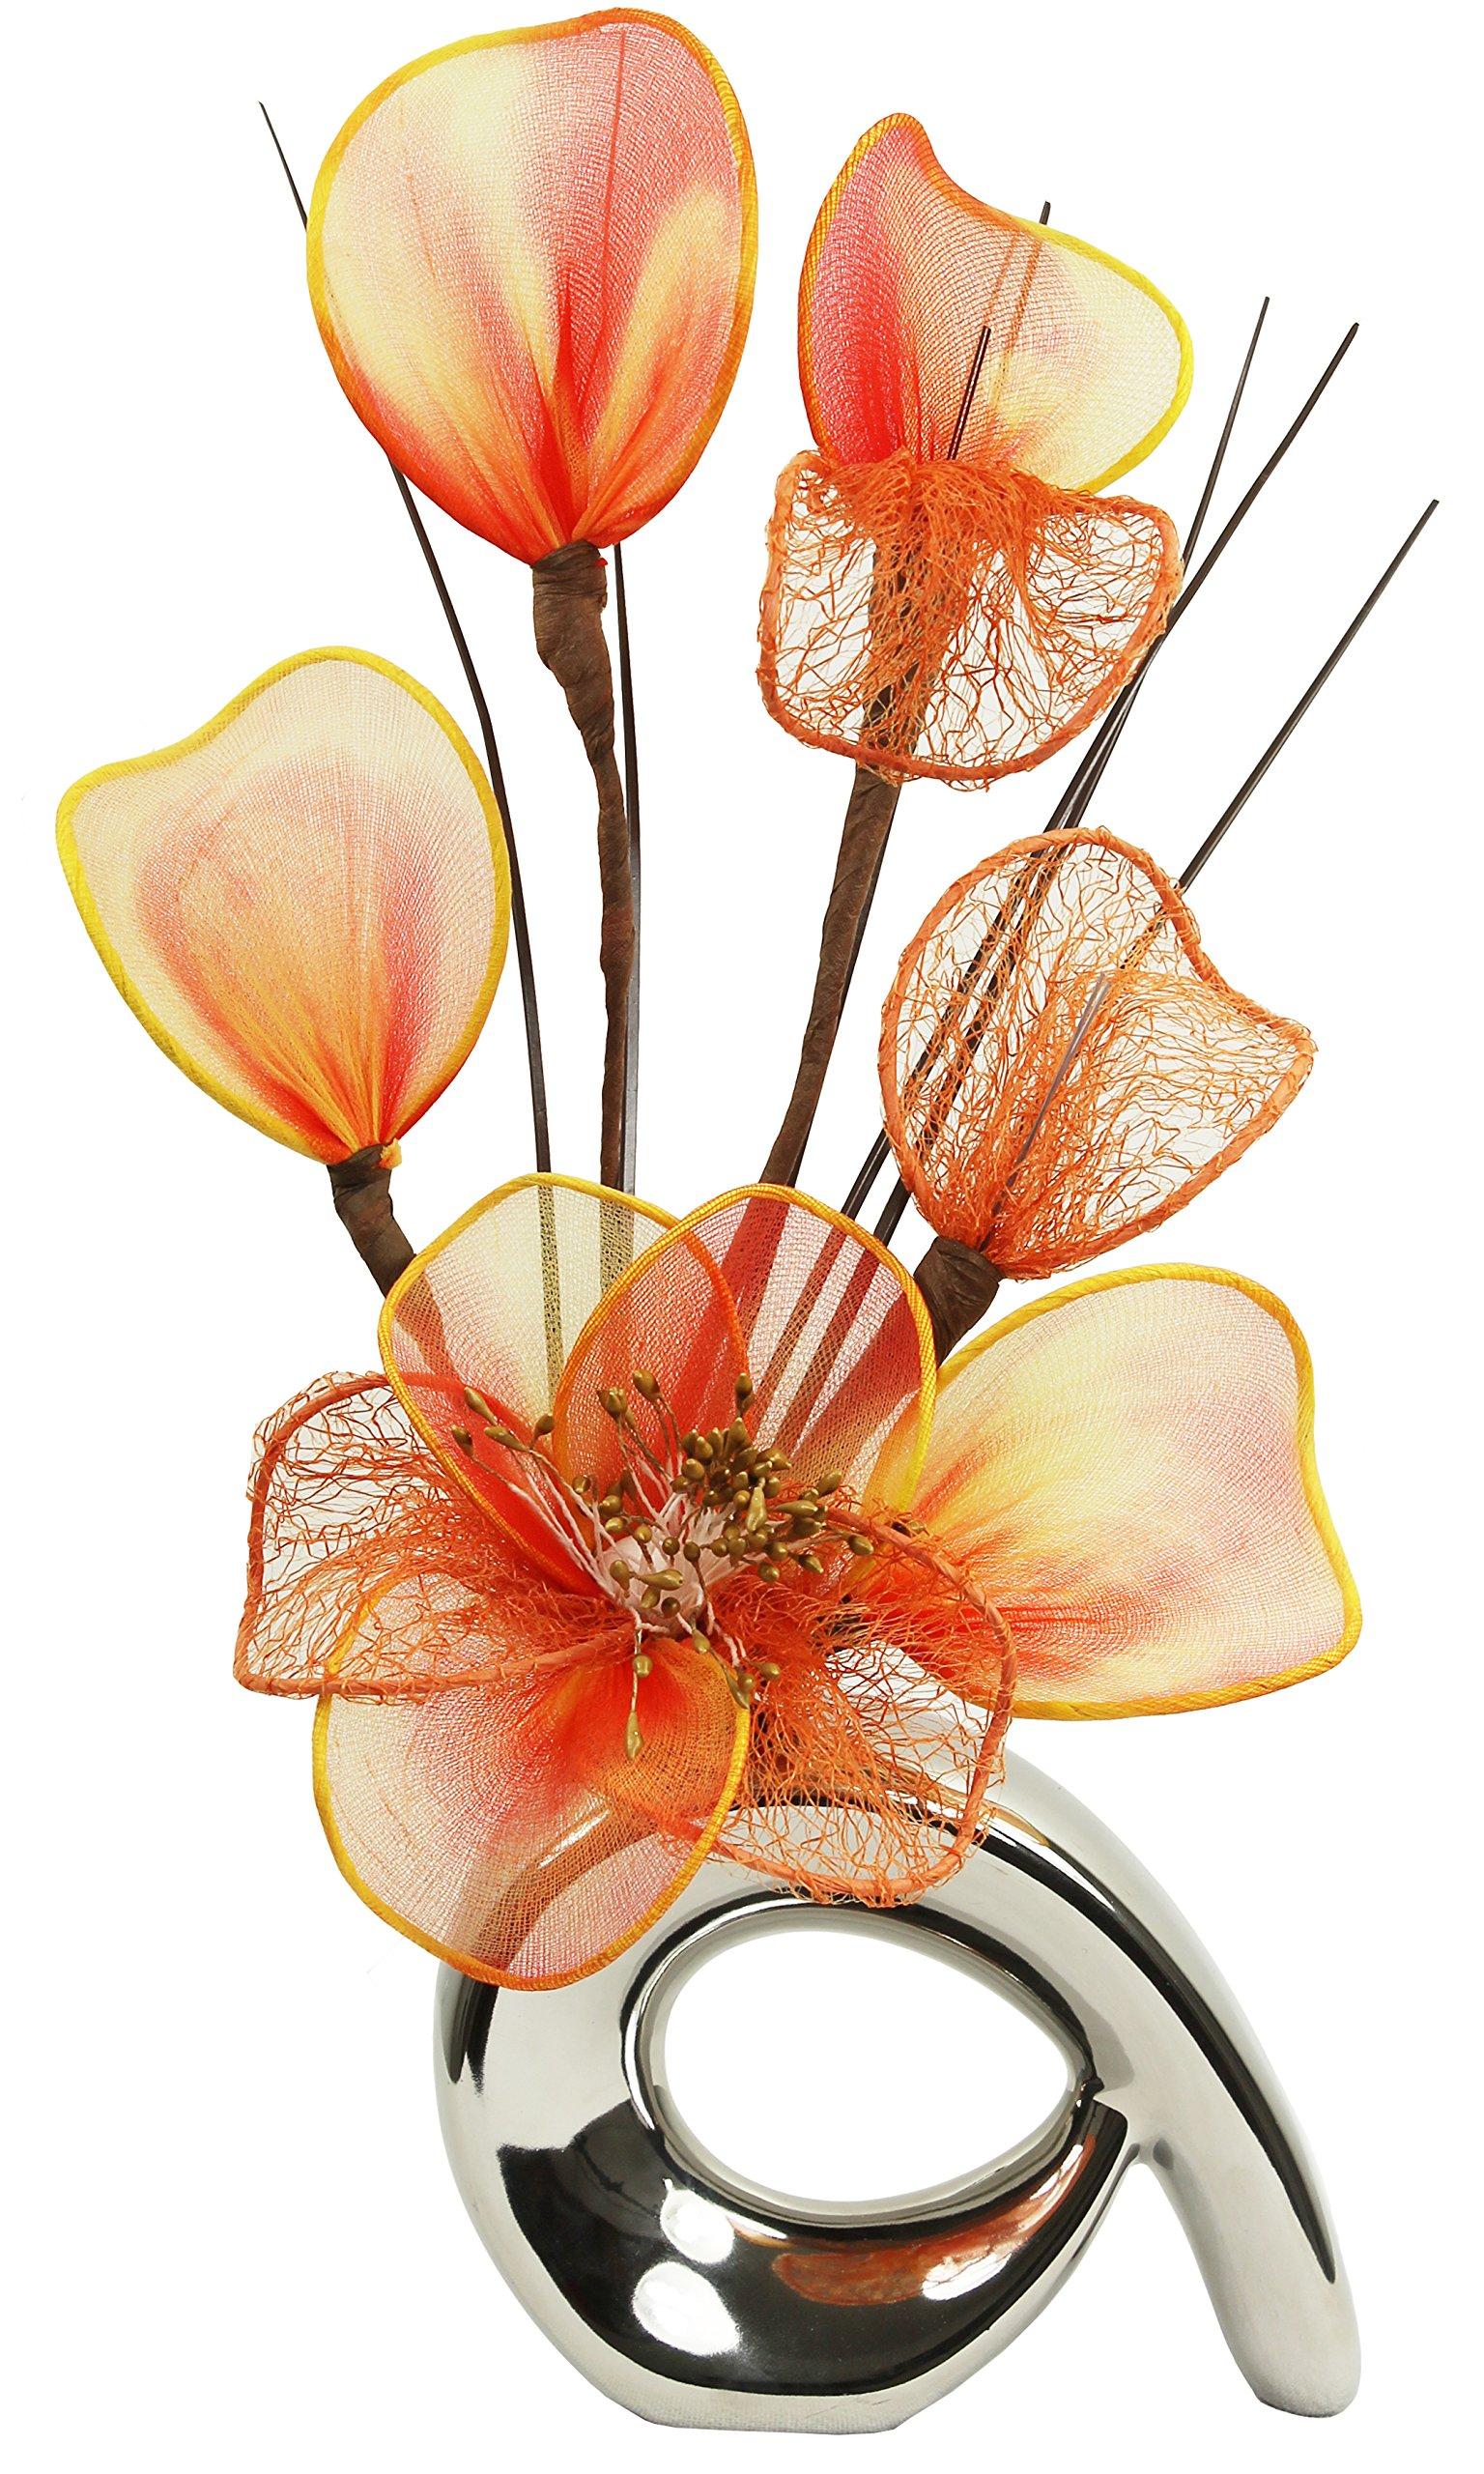 Flourish 792862 qh1 silver vase with orange nylon artificial flourish 792862 qh1 silver vase with orange nylon artificial flowers in vase reviewsmspy